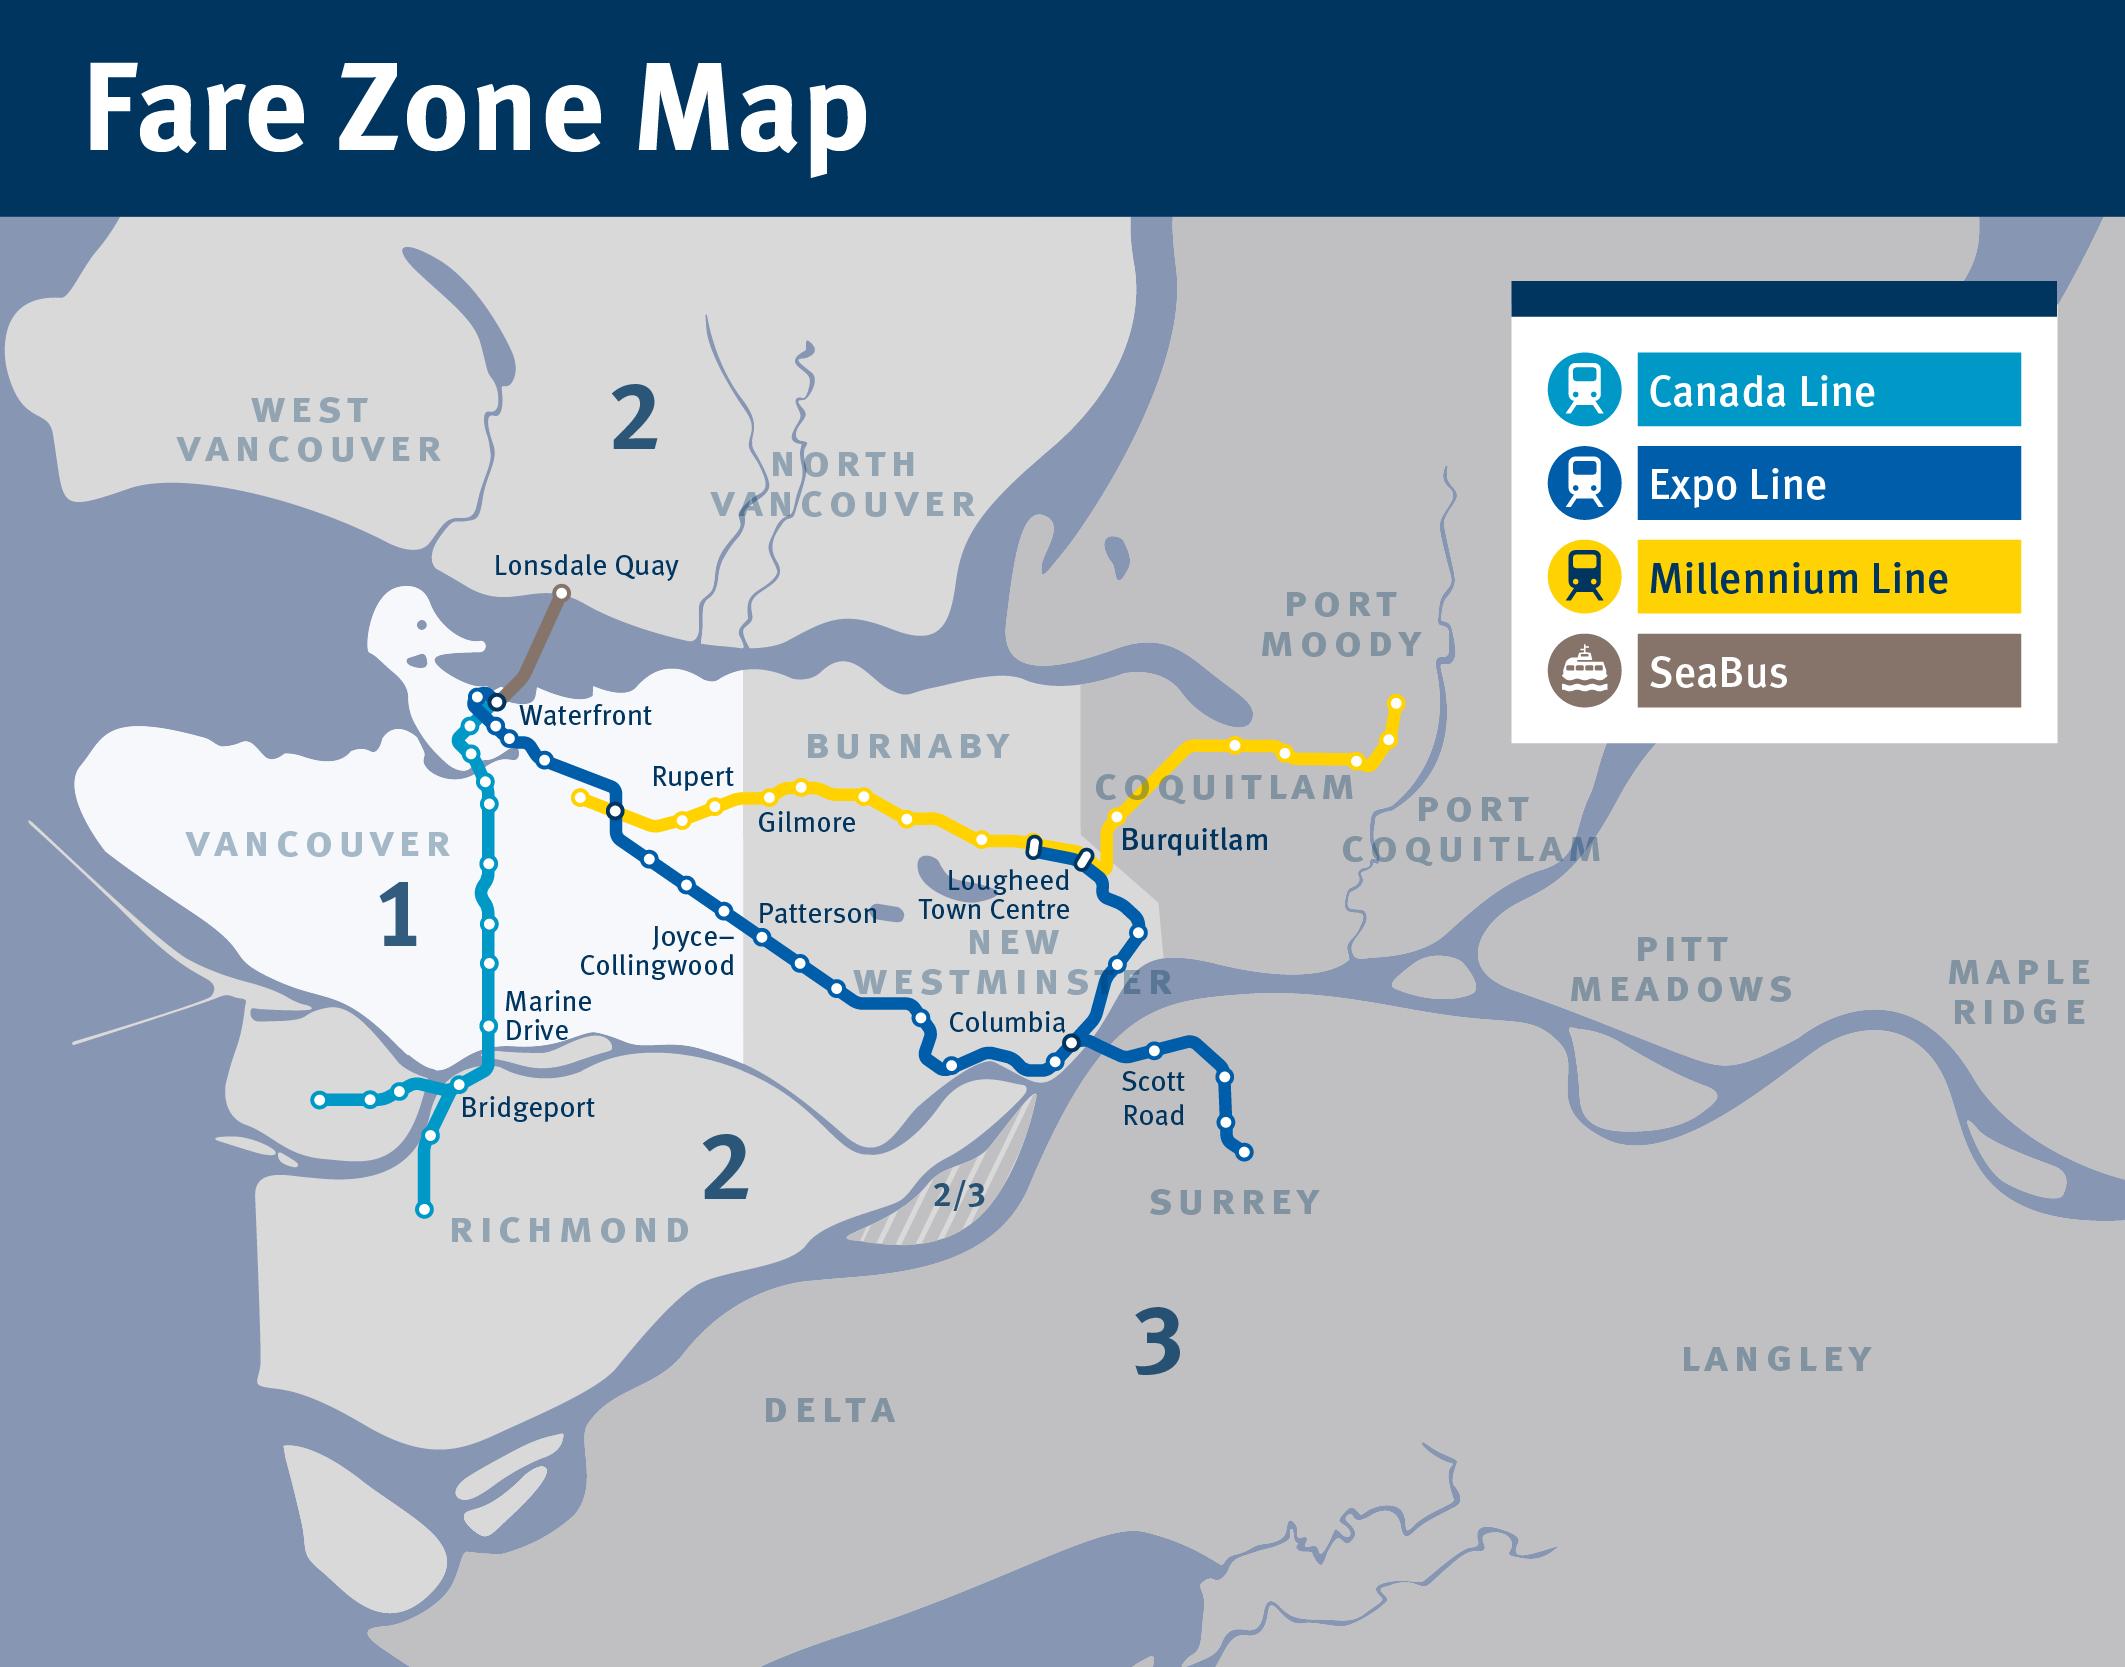 Canada Line Fare Zone Map Pin on Travel